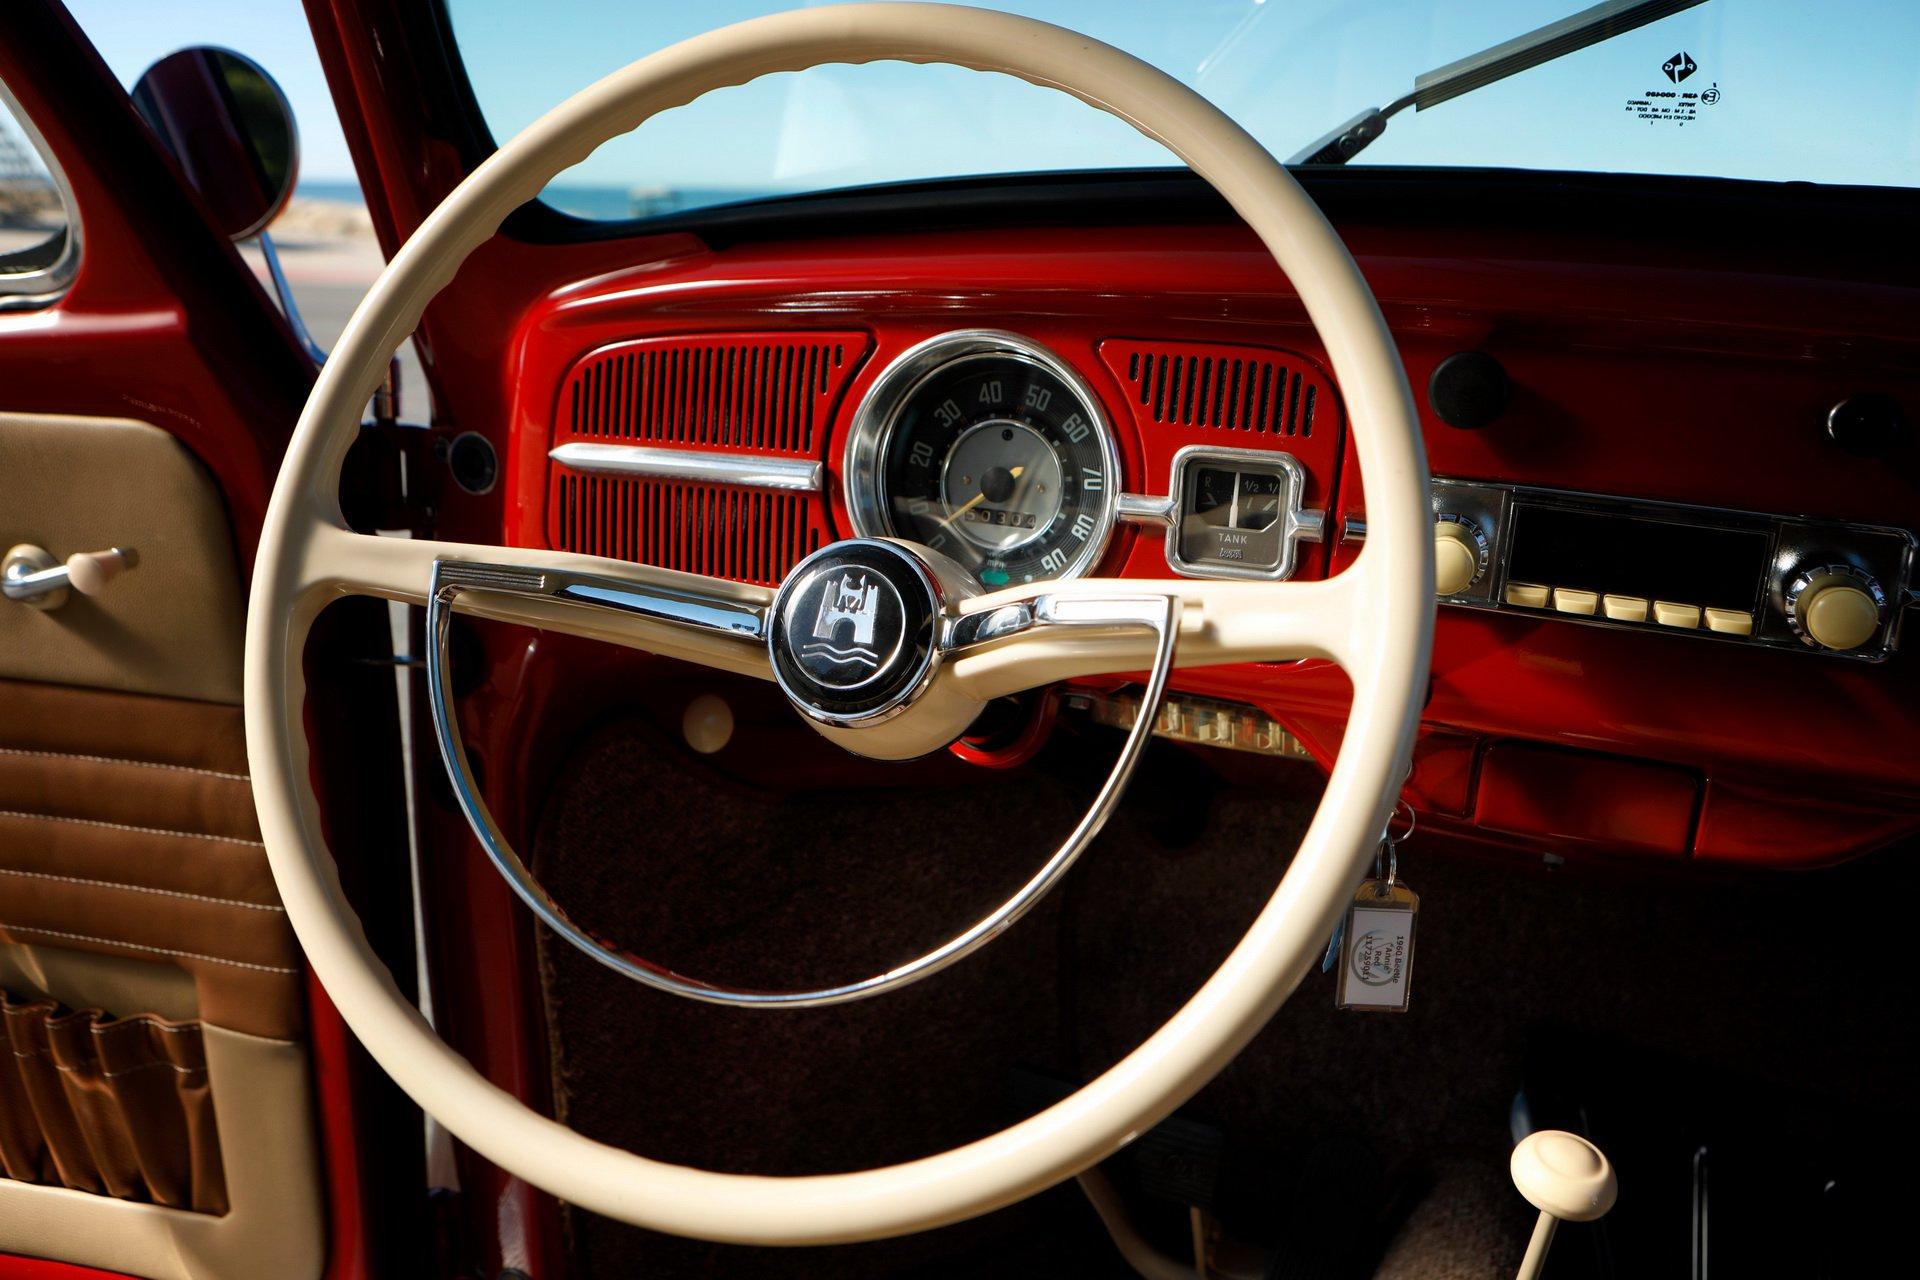 Volkswagen Restores 1966 Beetle To Perfection - autoevolution